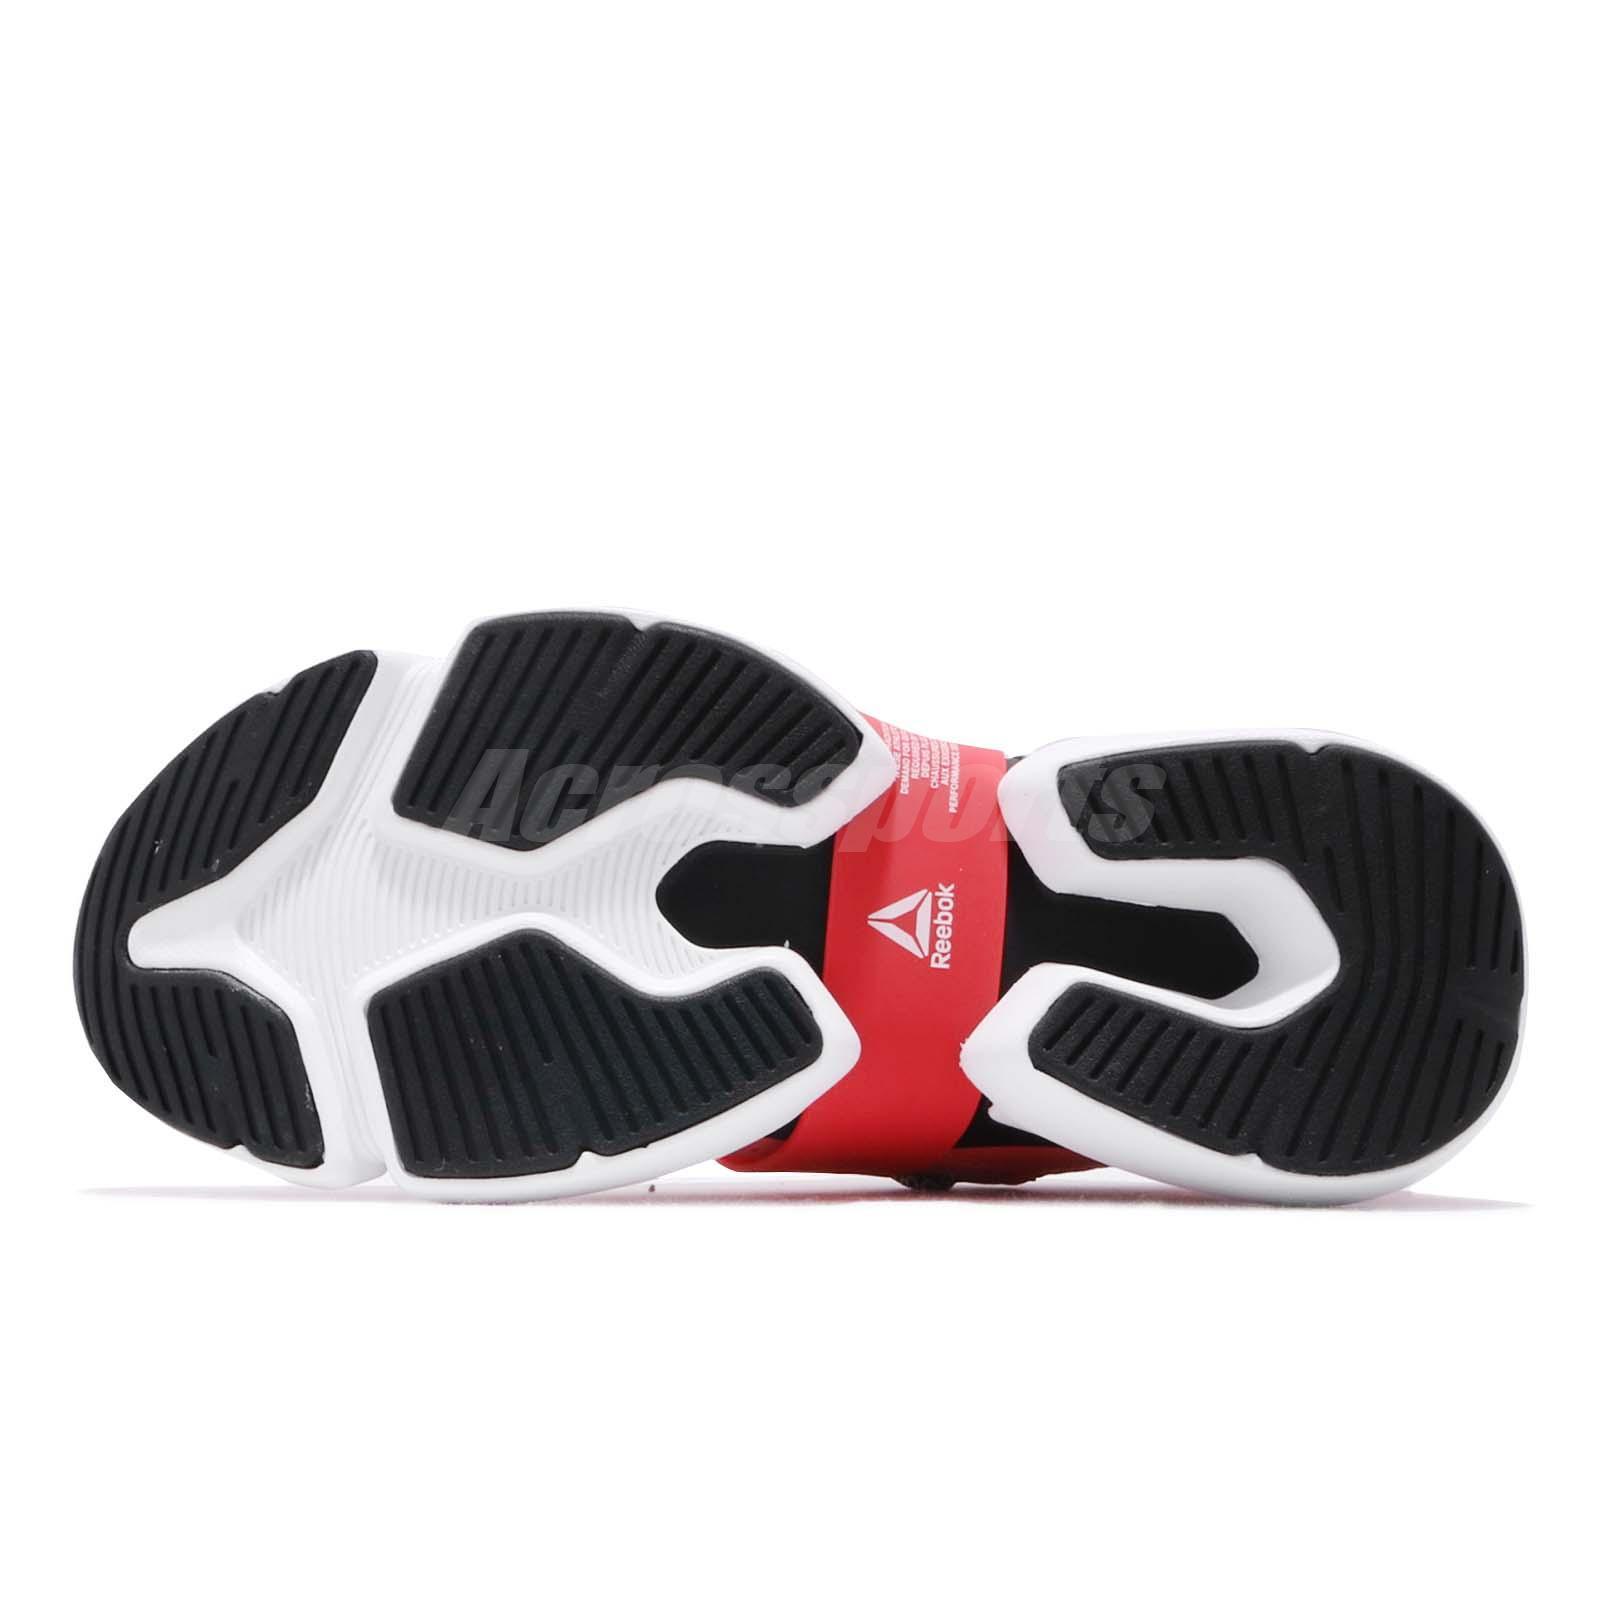 Reebok Split Flex Rose Red White Black Women Cross Training Shoes ... 67804a90fe3